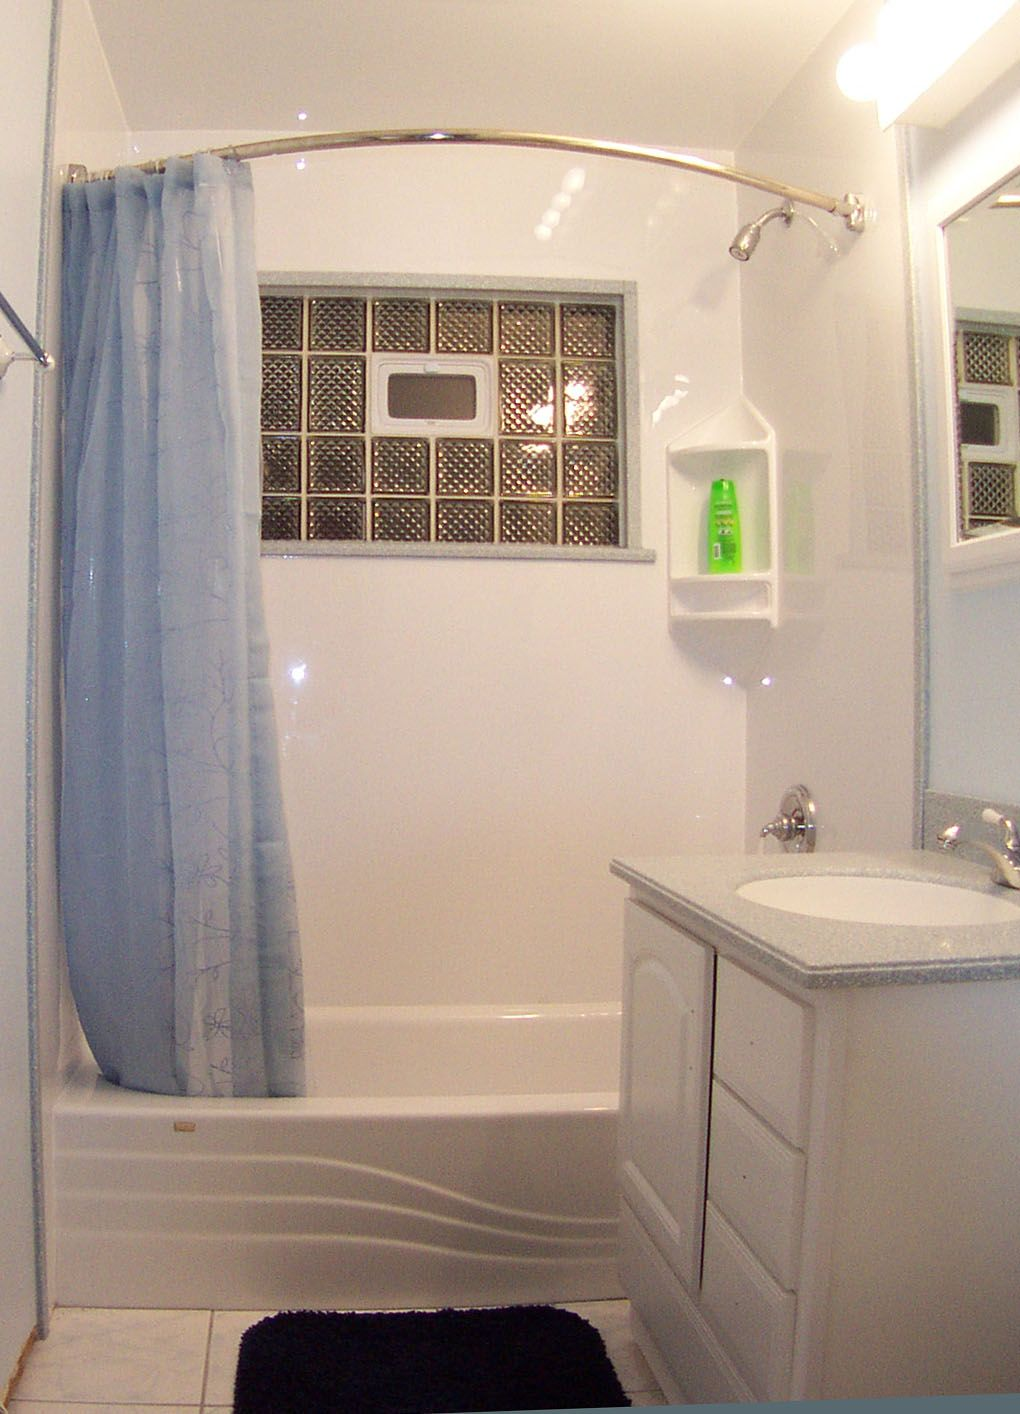 Simple designs for small bathrooms   Bathroom design small ... on Simple Bathroom Designs For Small Spaces  id=30483